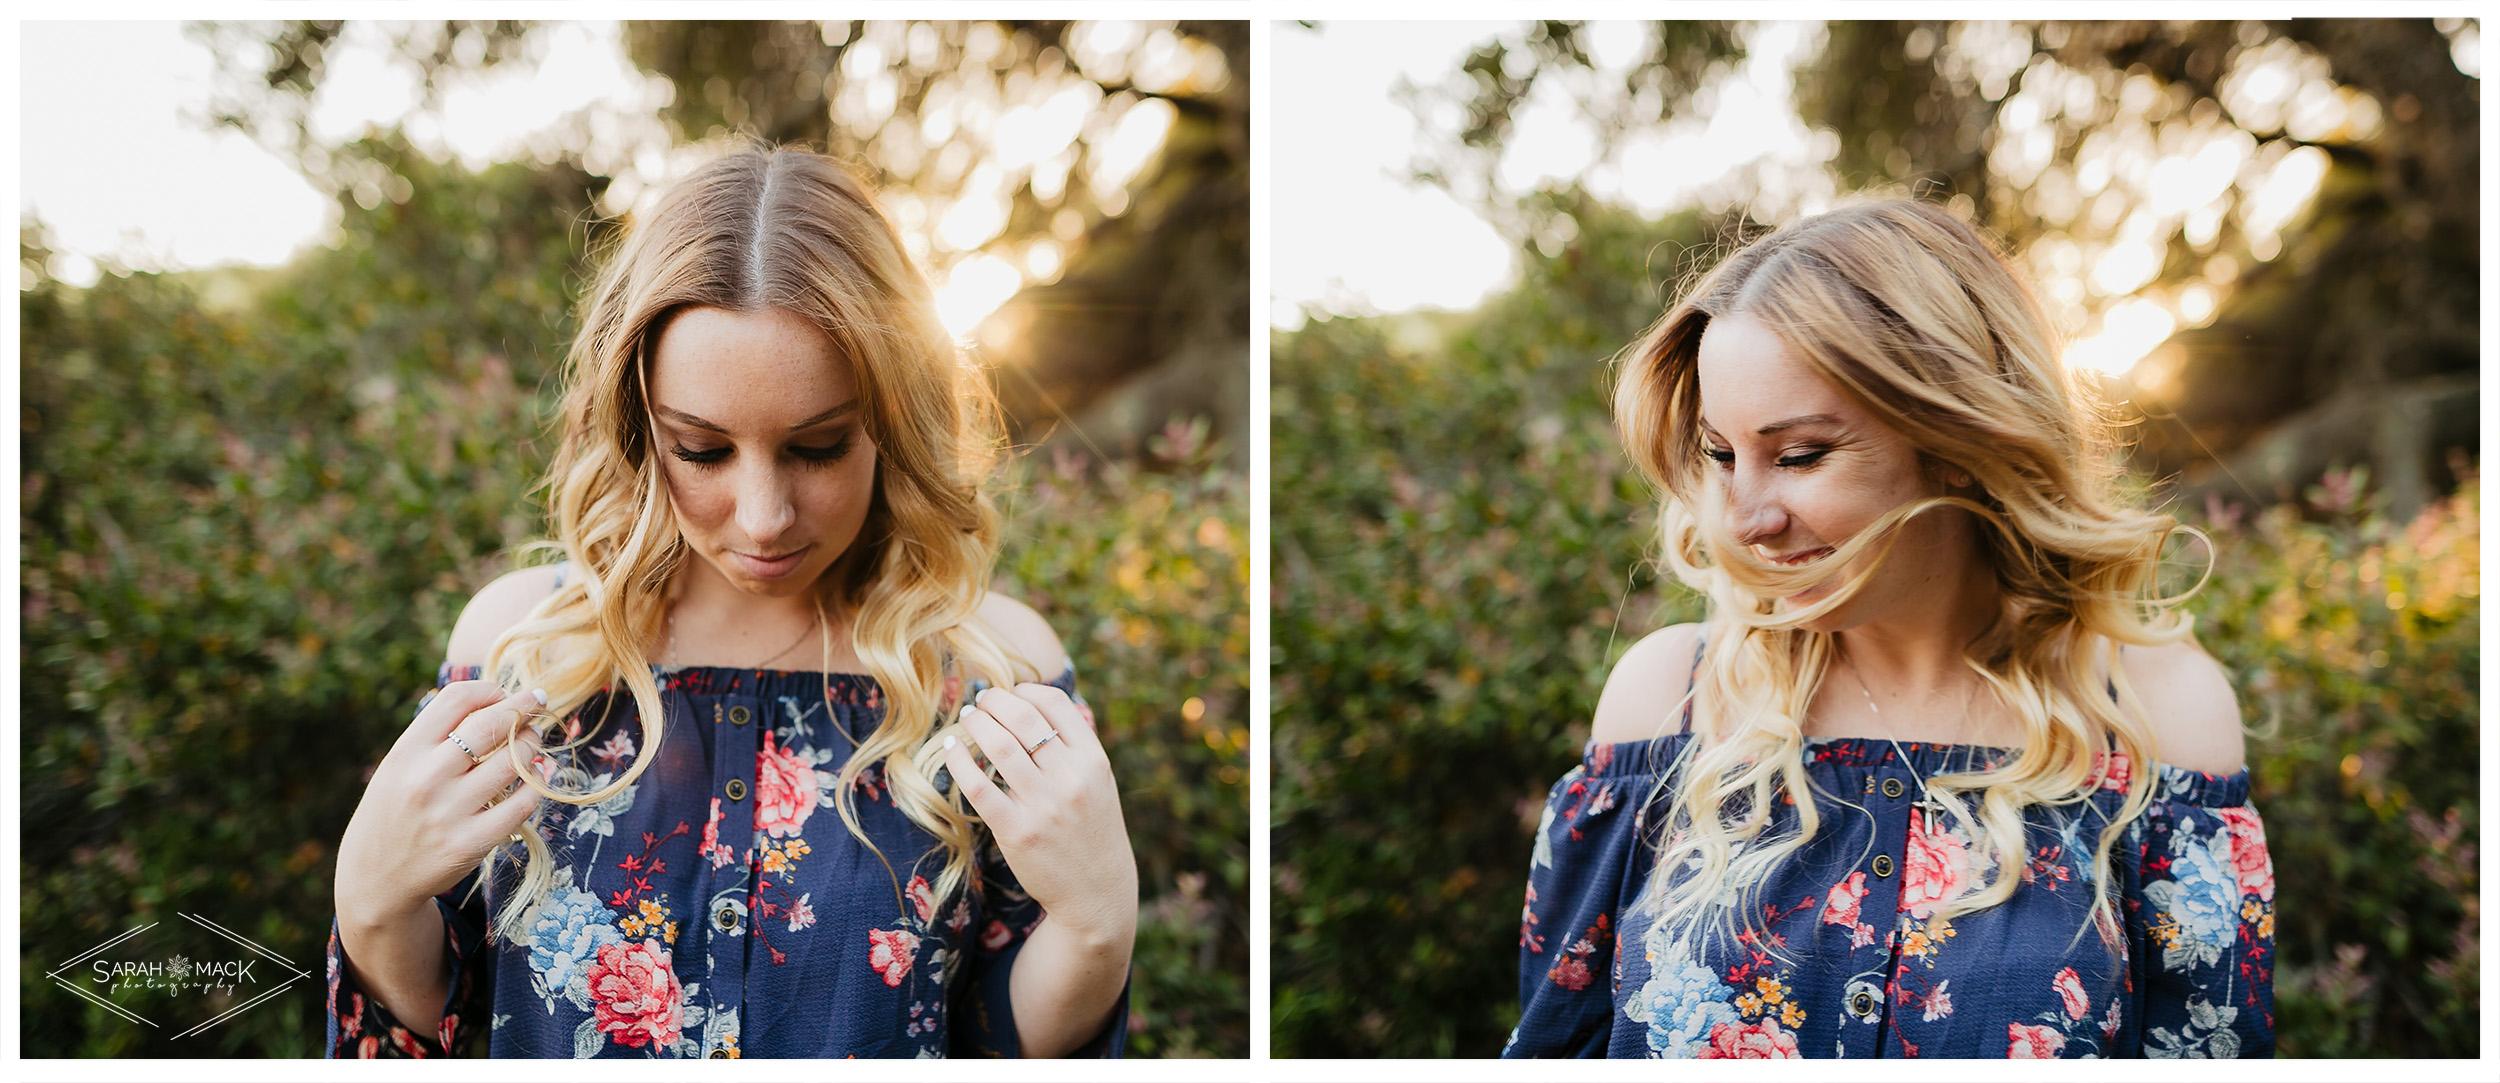 A-Orange-COunty-Granduation-Portraits-5.jpg